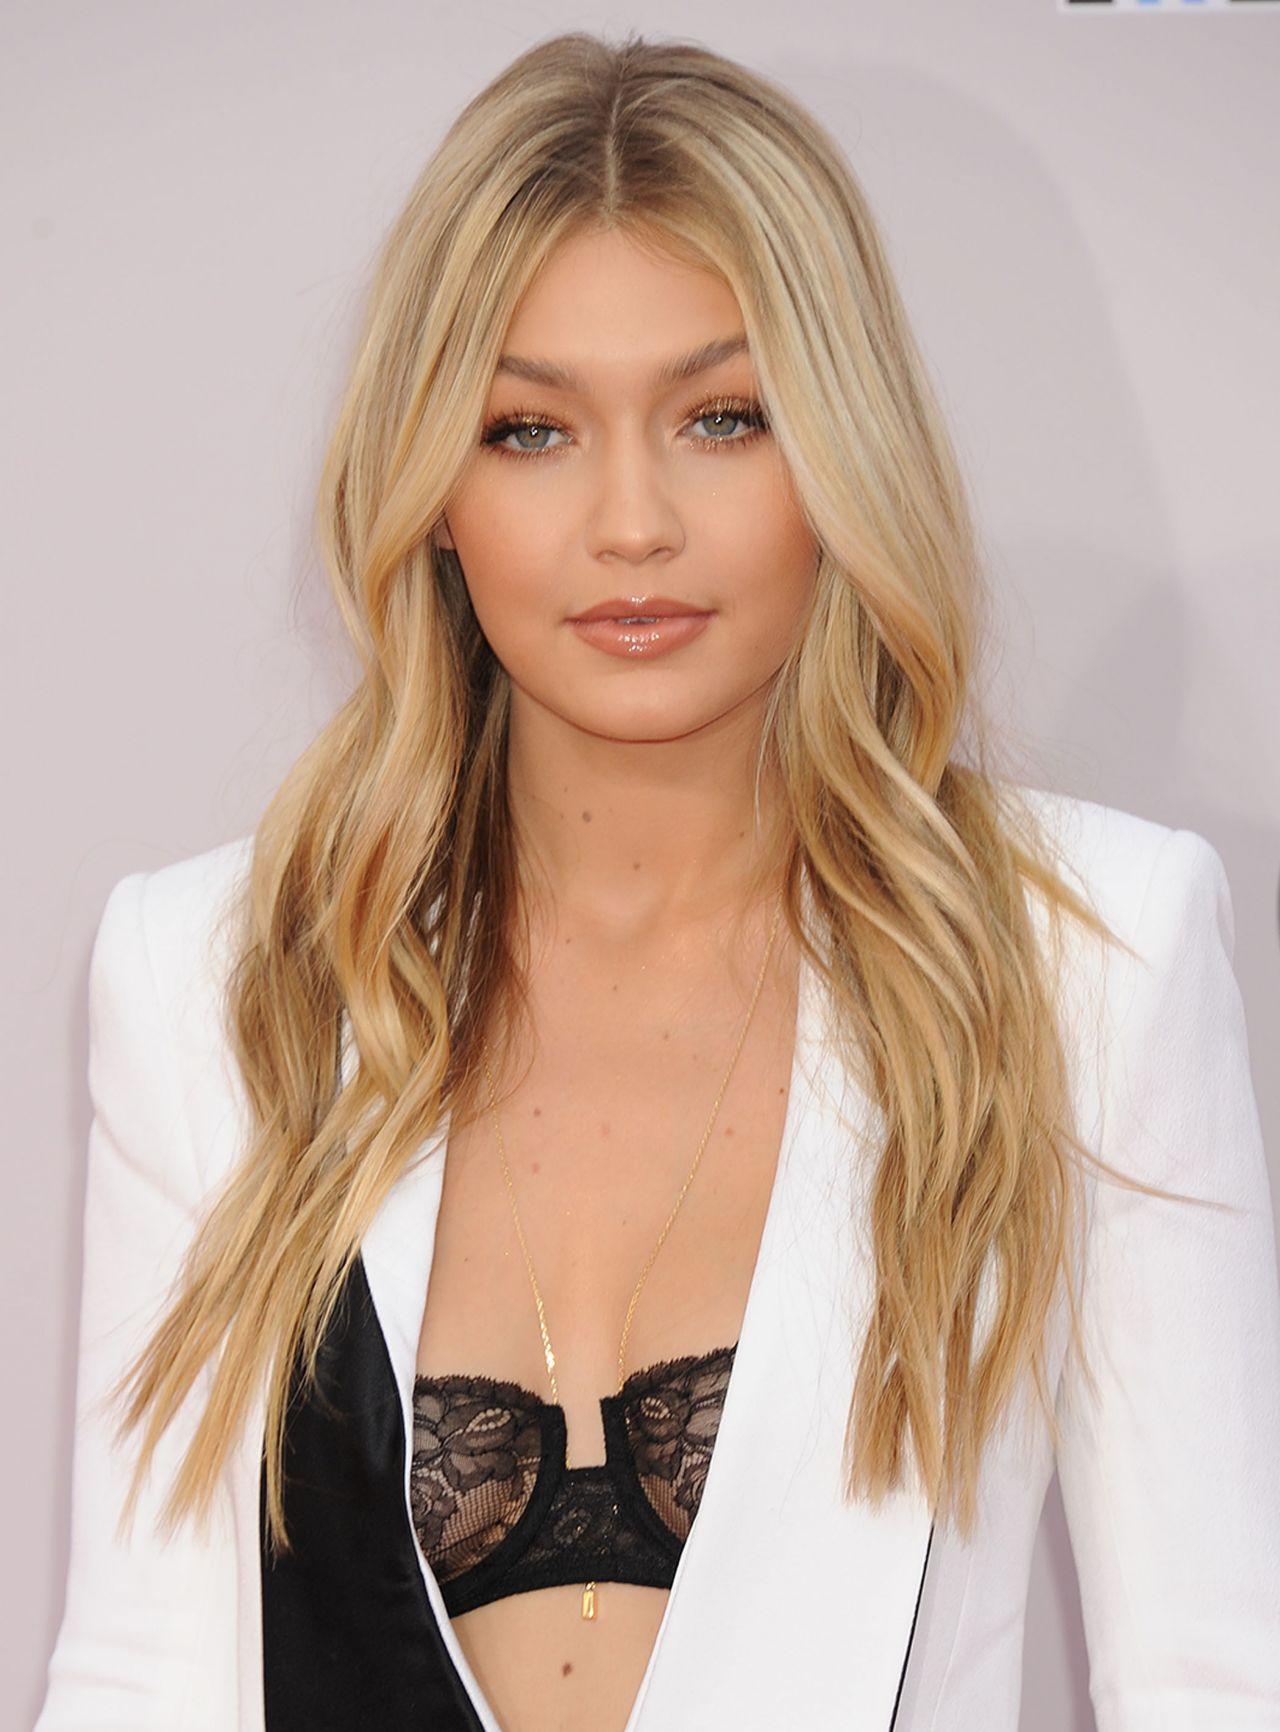 Gigi Hadid S 6 Drugstore Lipstick Is A Kylie Lip Kit Dupe: Gigi Hadid Red Carpet Photos